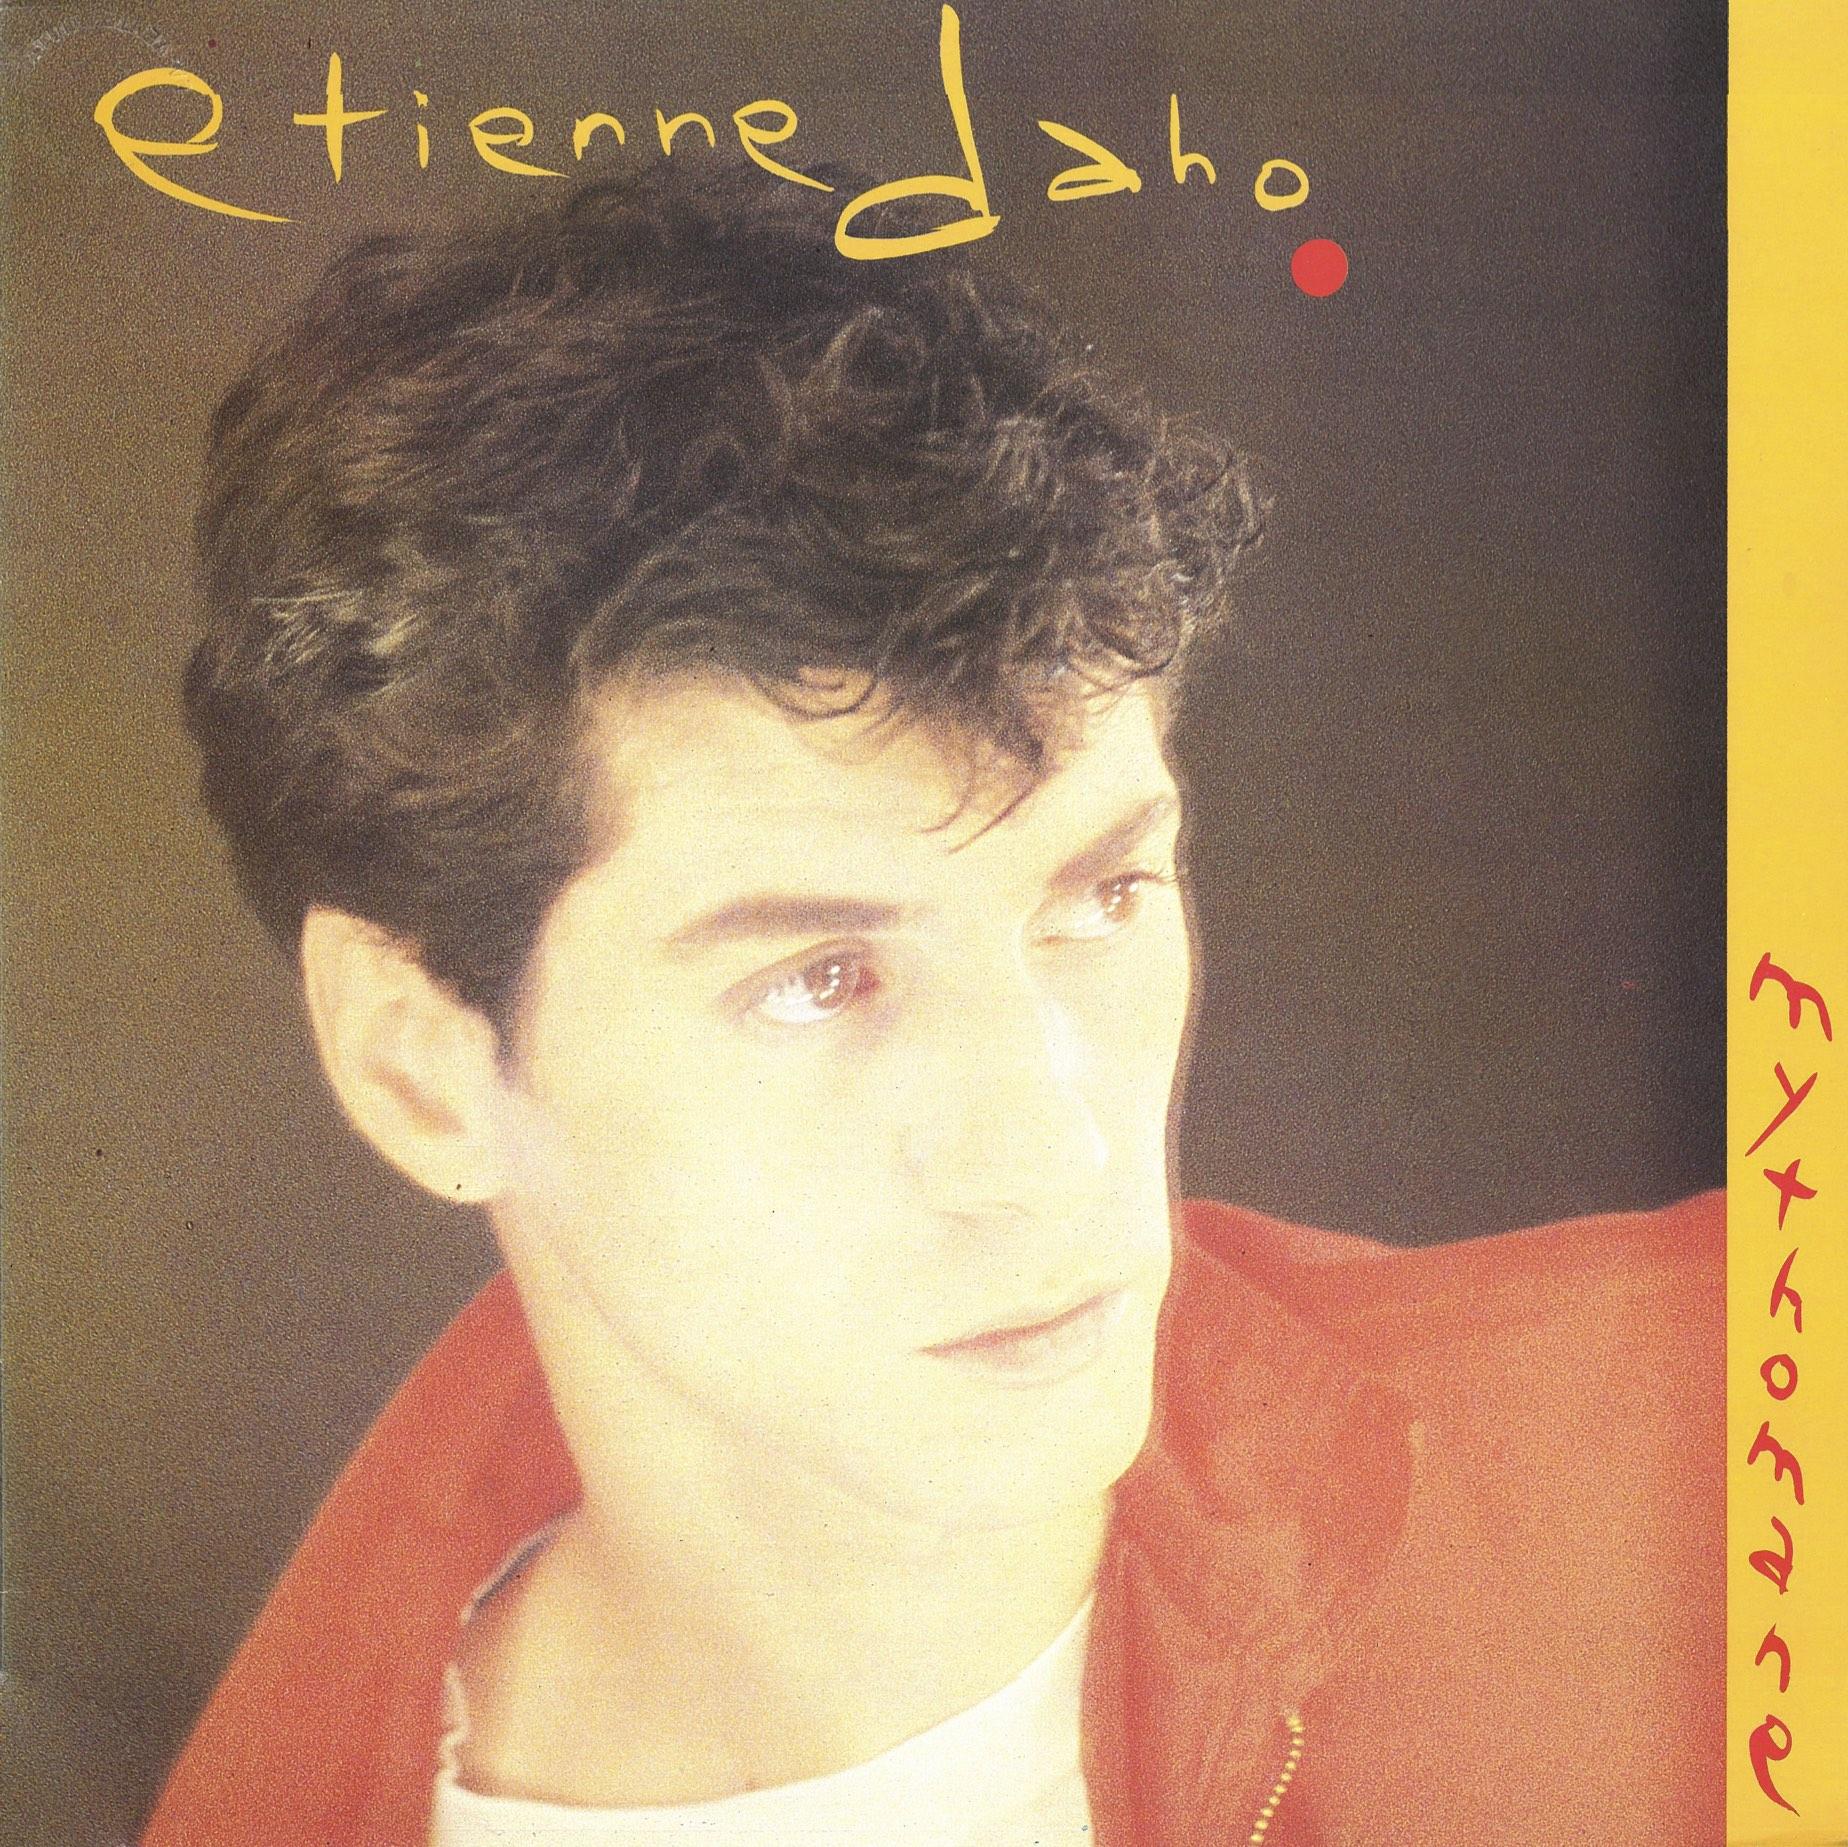 1980 - Etienne Daho